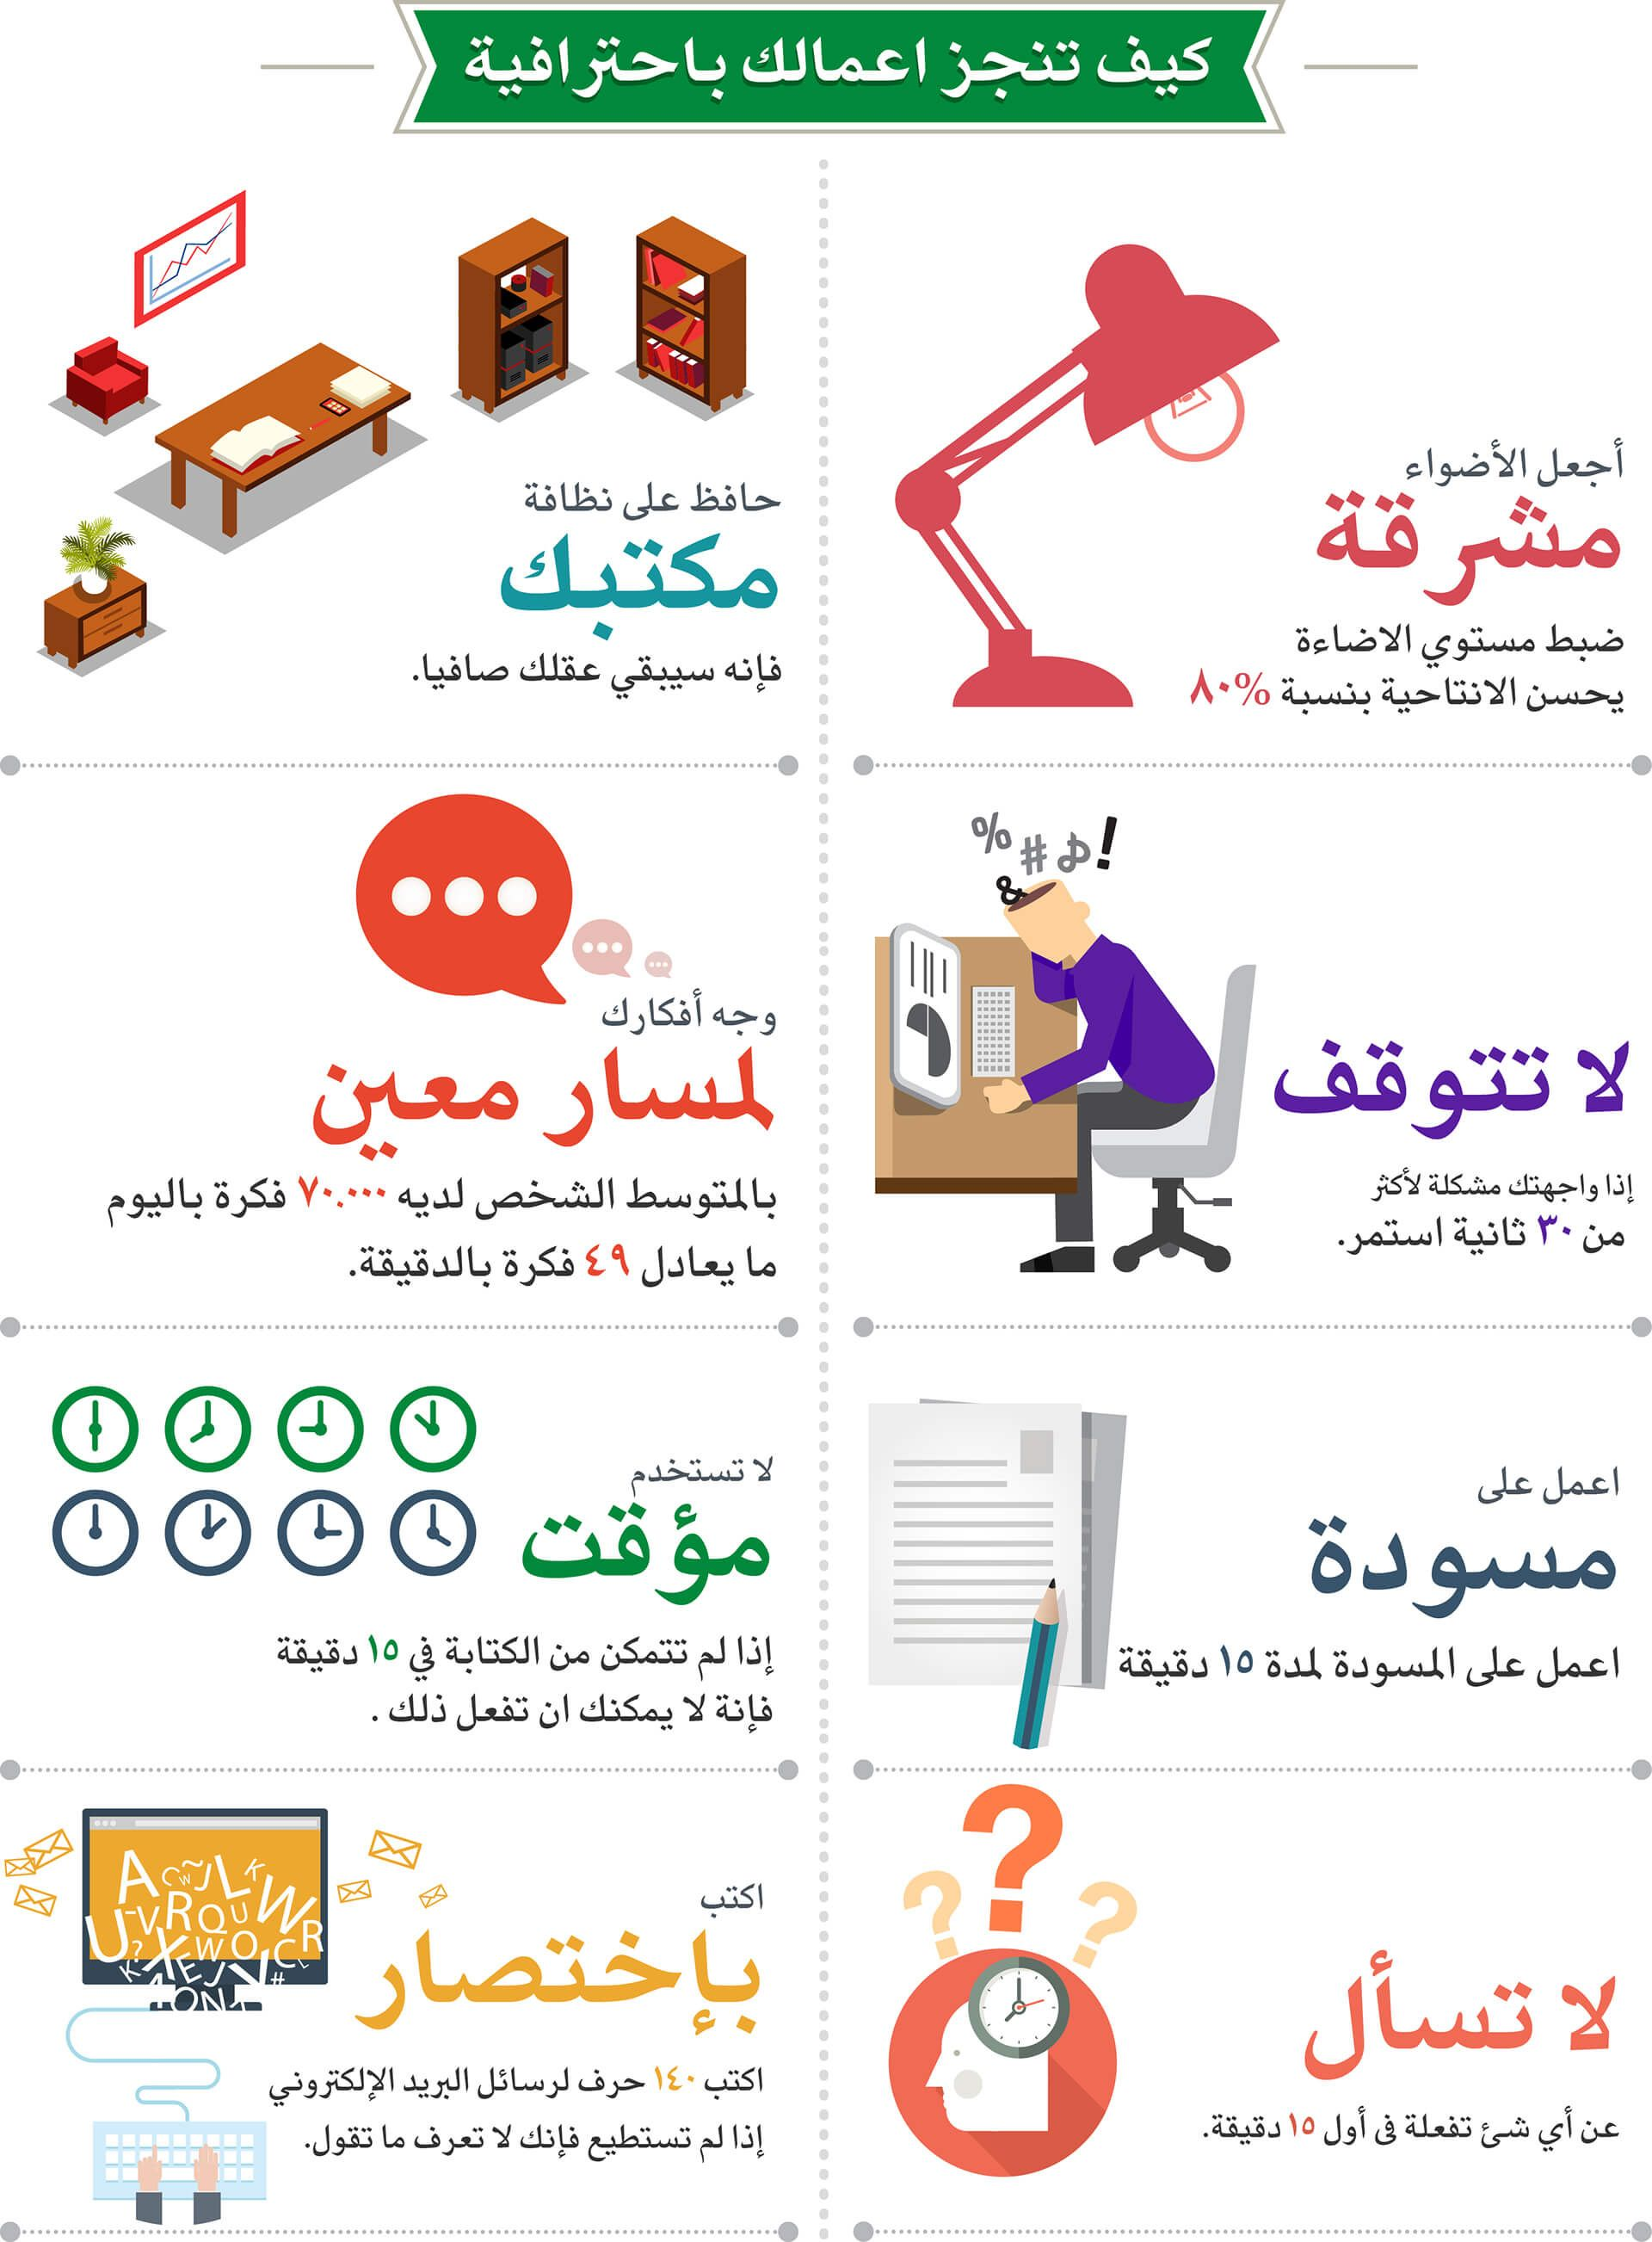 Pin By Mohammed On Self Help معلومات تطوير الذات Life Skills Activities Learning Websites Life Skills